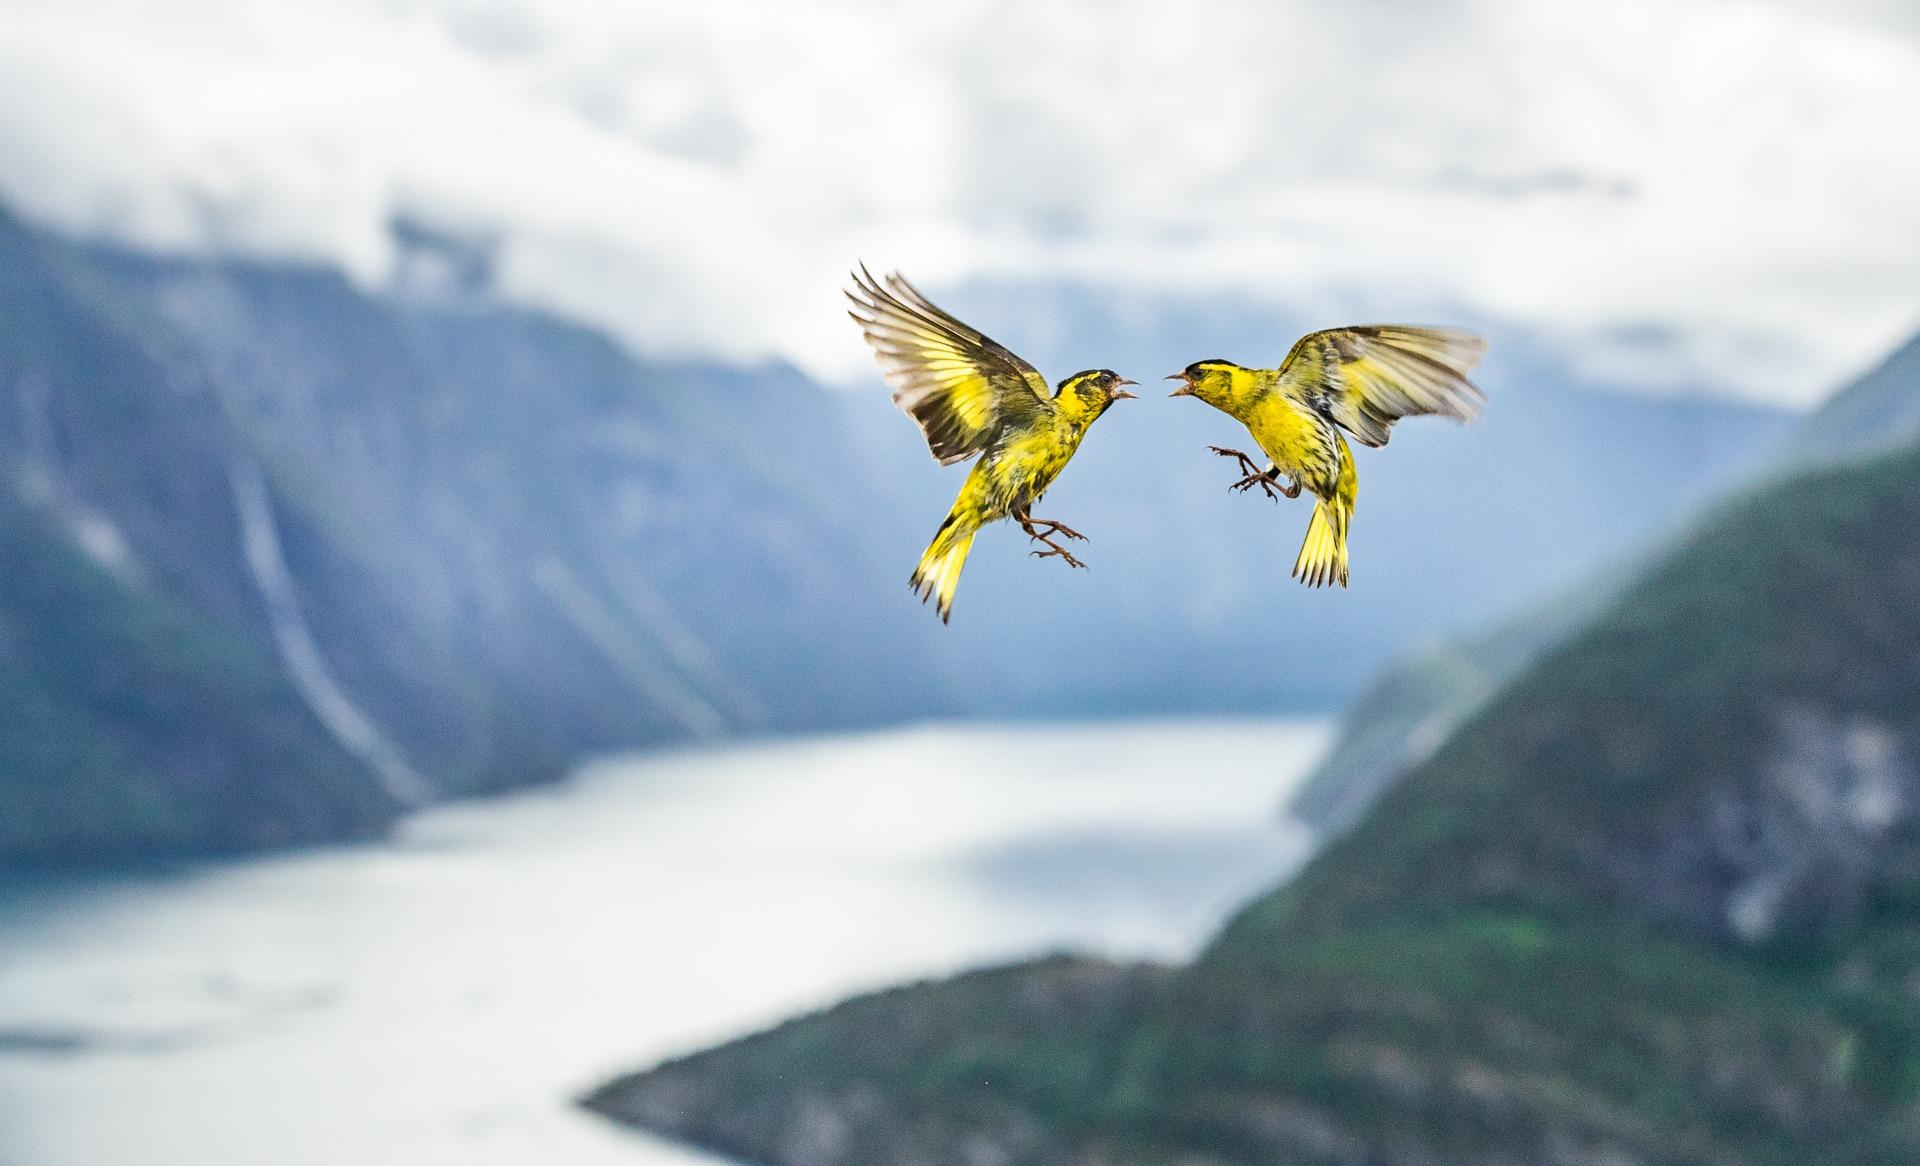 C01_76744_Birds_finalist_Fjord-Fight_Bernt-%C3%98sthus_NOR.jpg